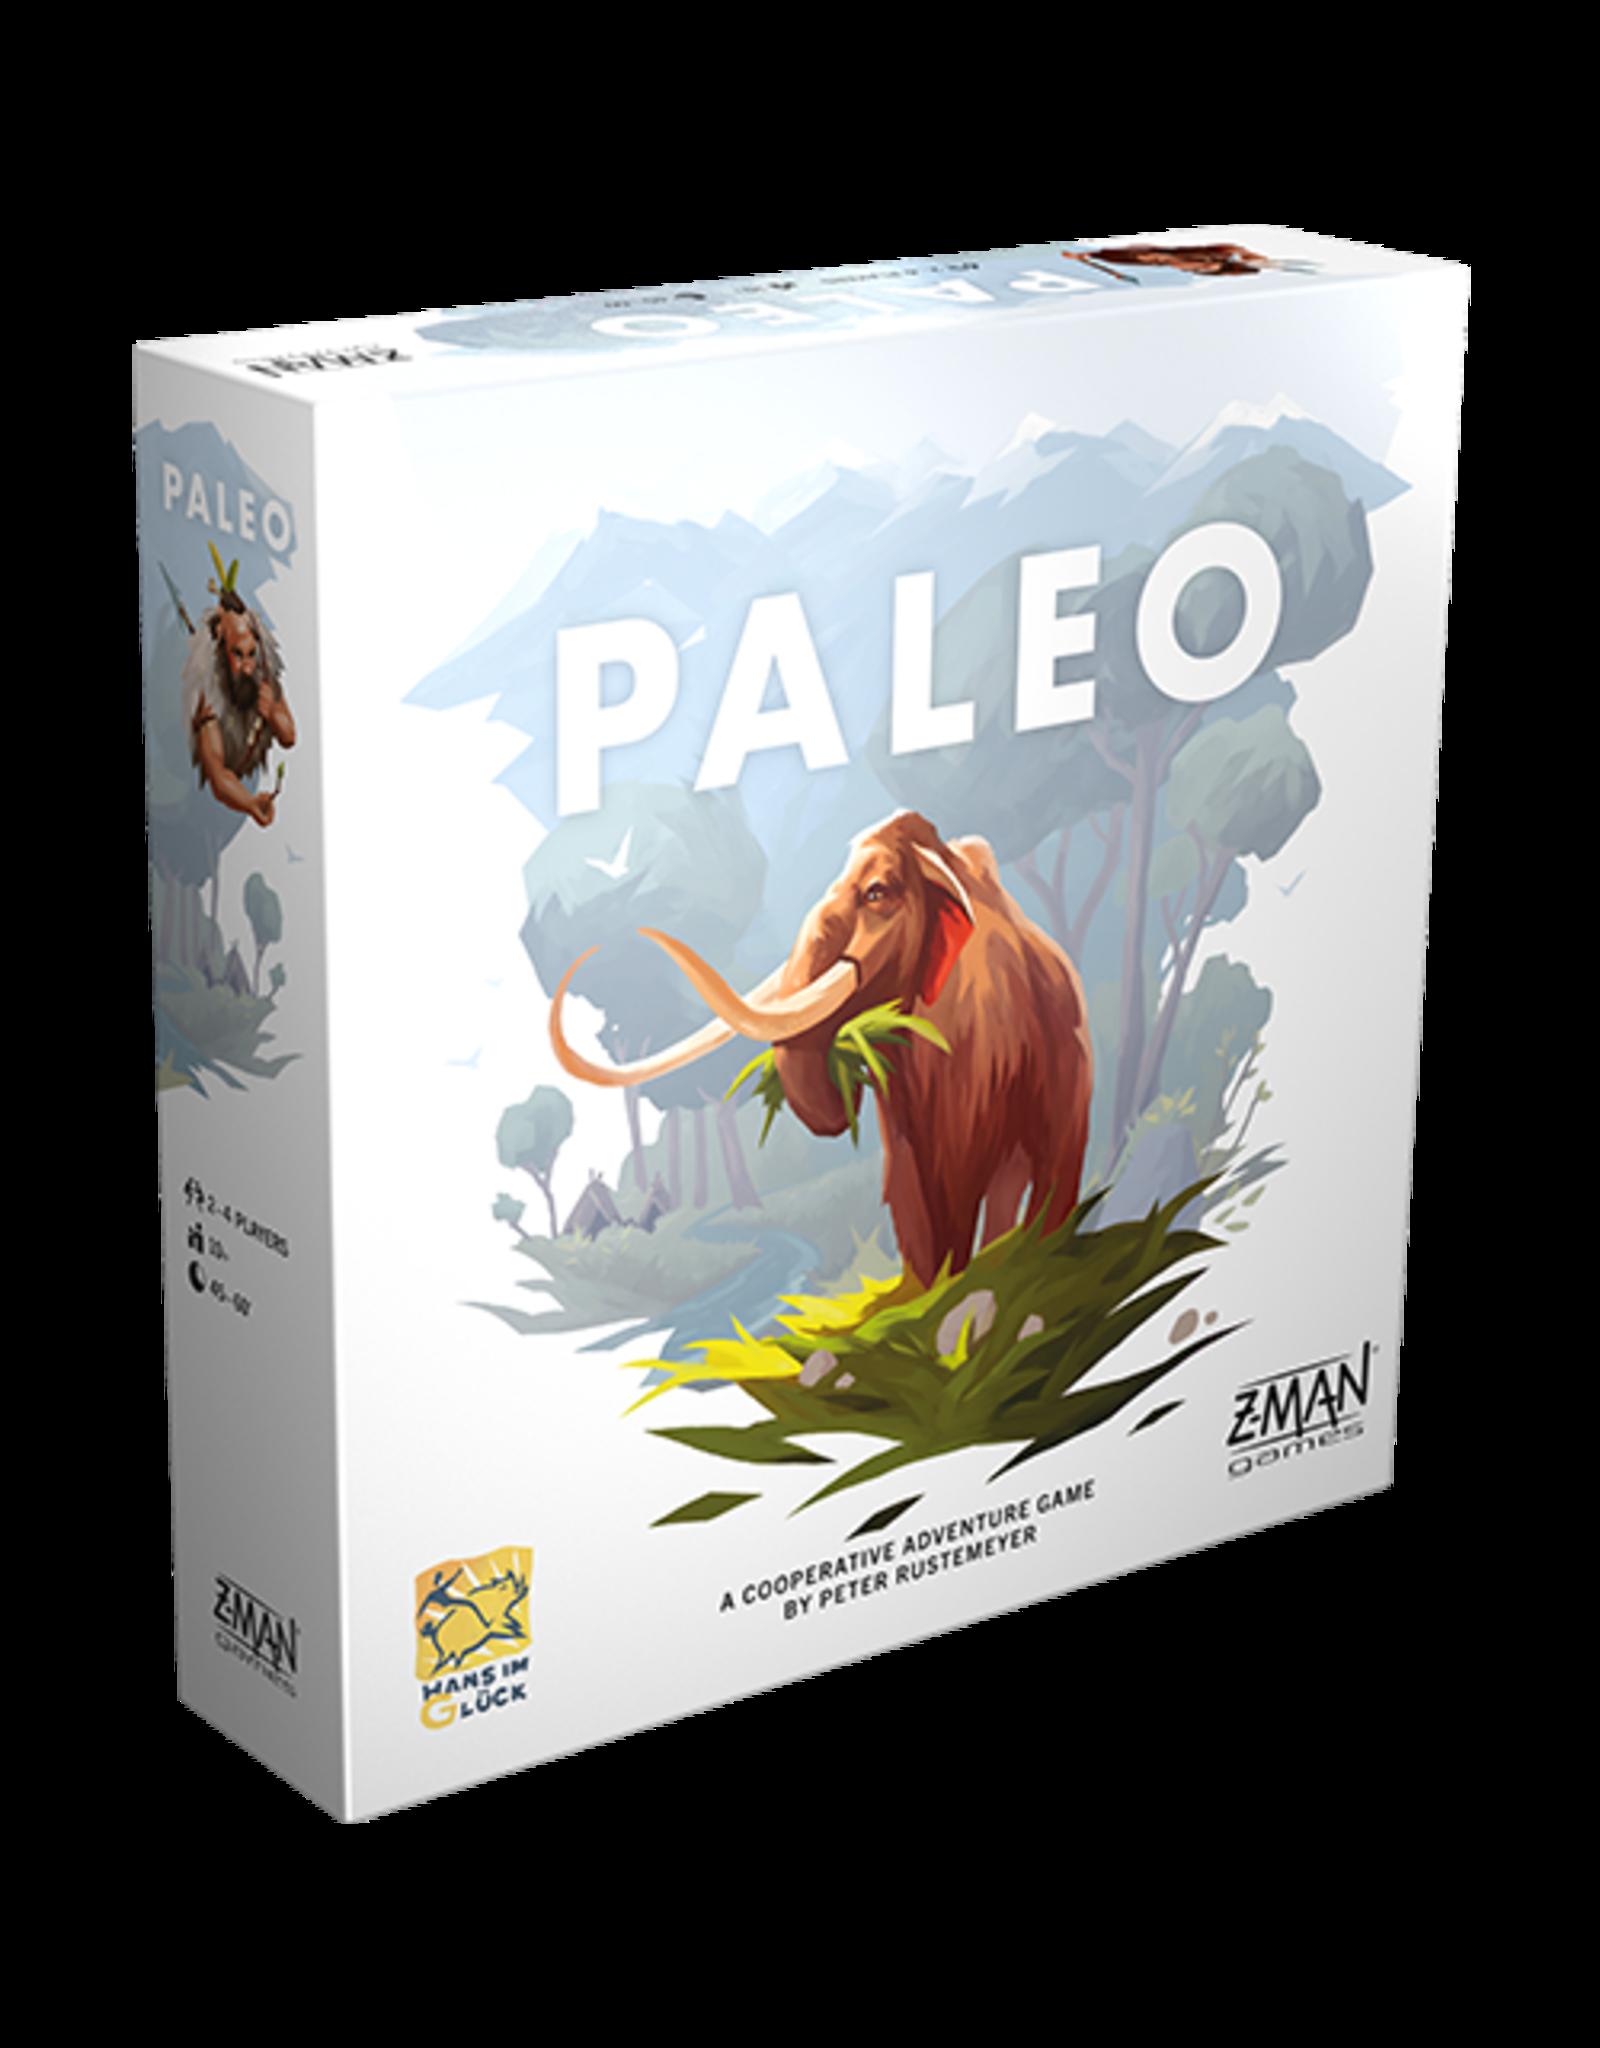 zman games Paleo